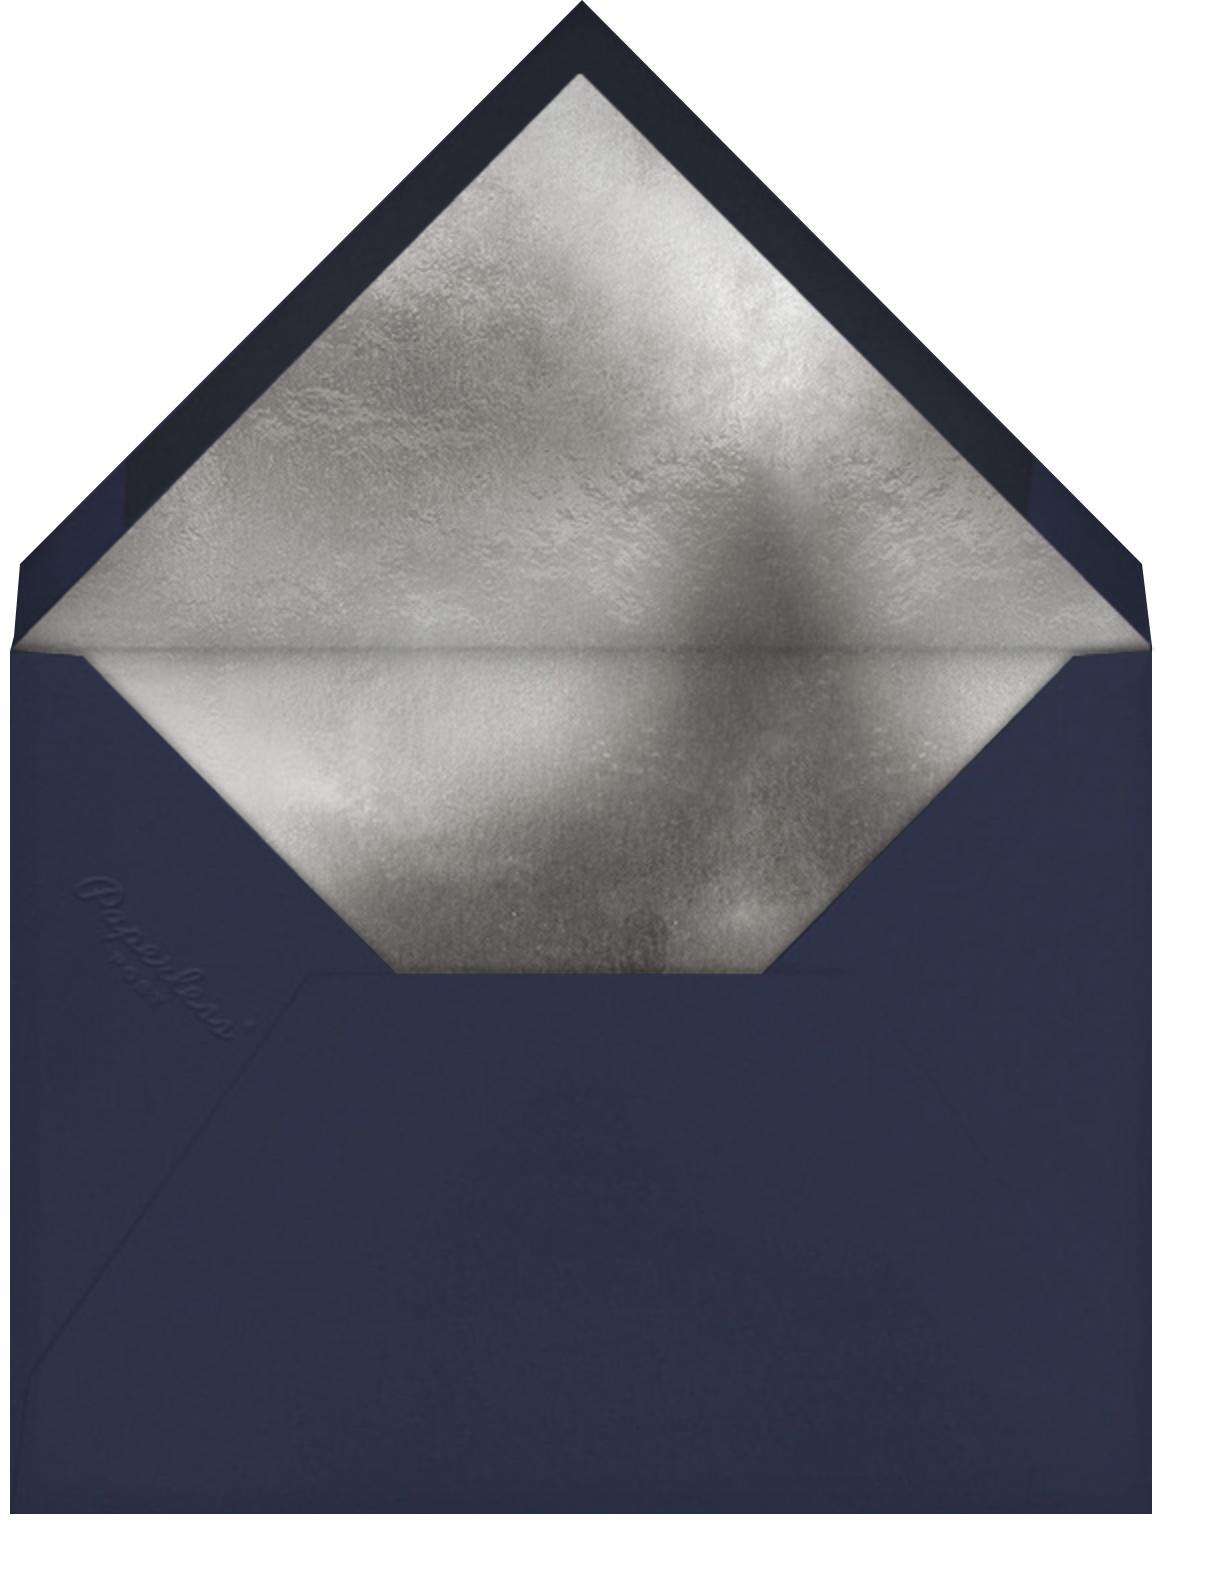 These Little Lights - Hanukkah - Paperless Post - Hanukkah - envelope back